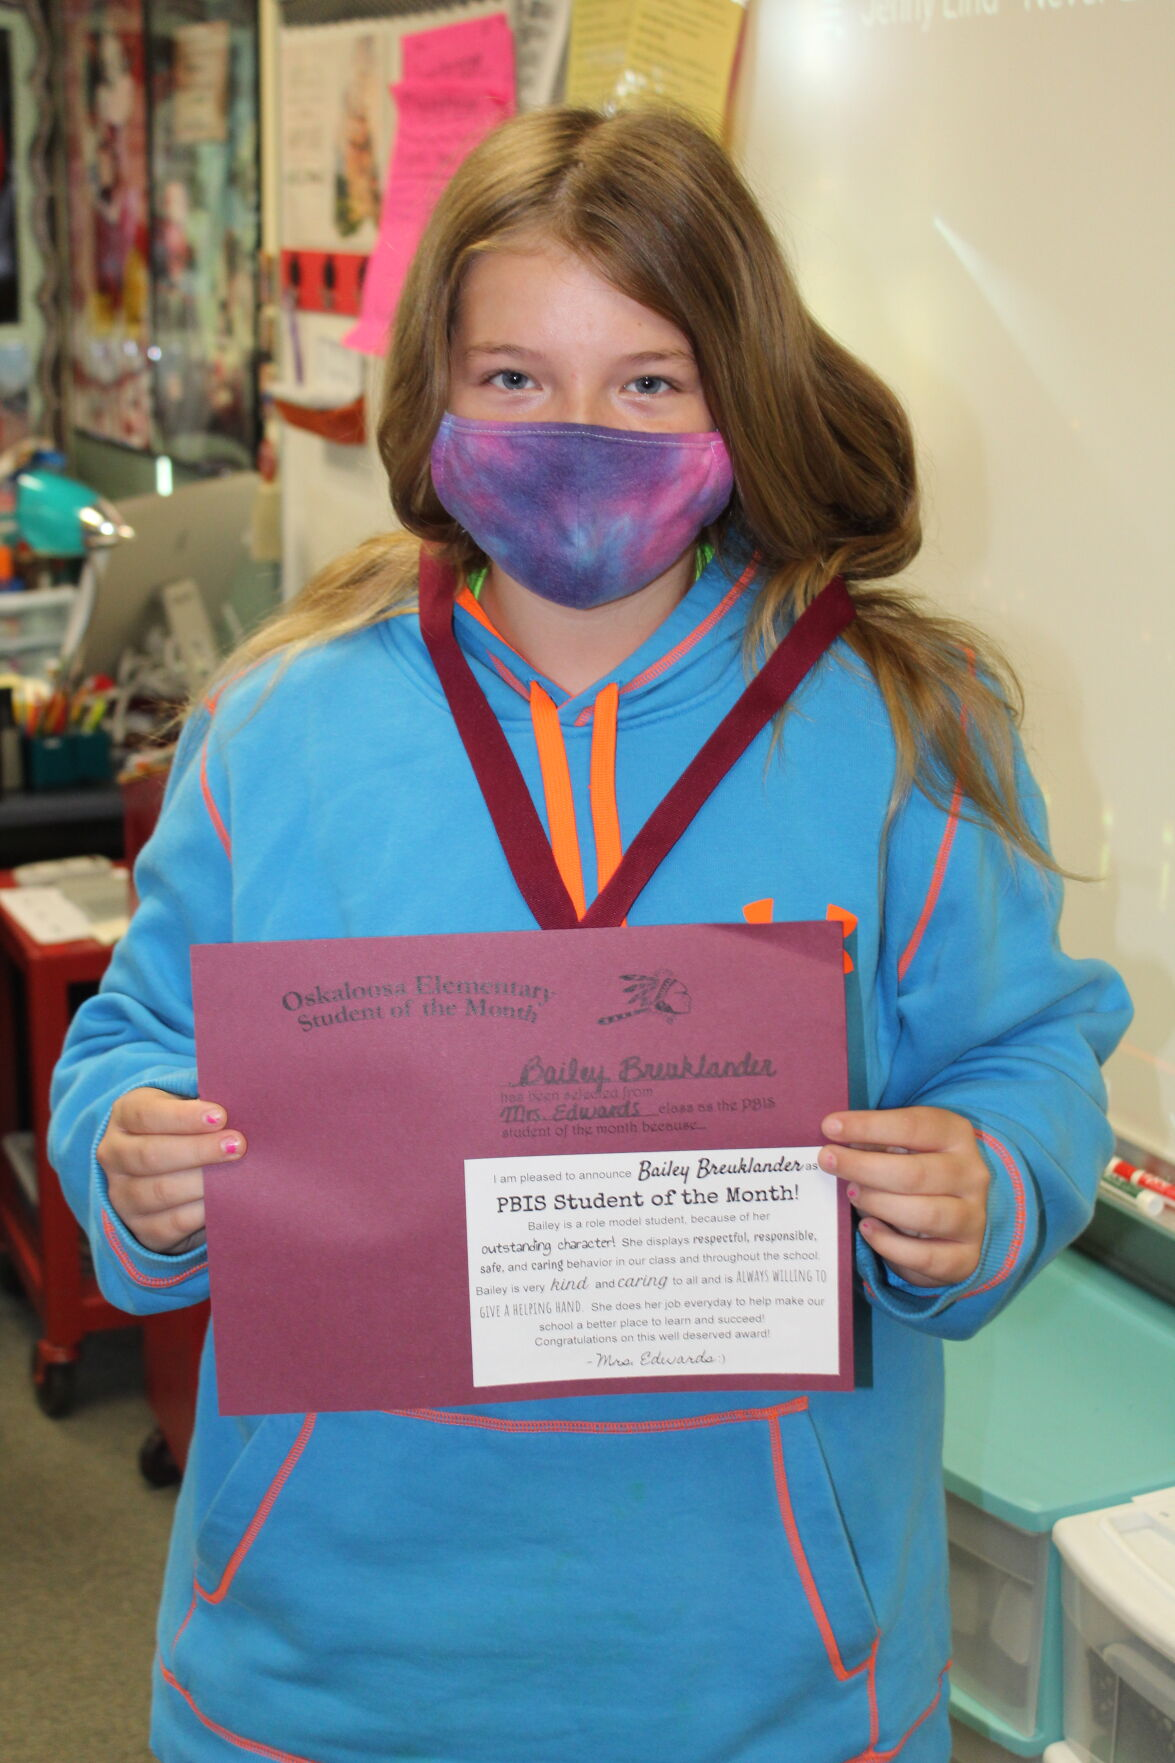 Bank Iowa Student of the Month: Bailey Breuklander